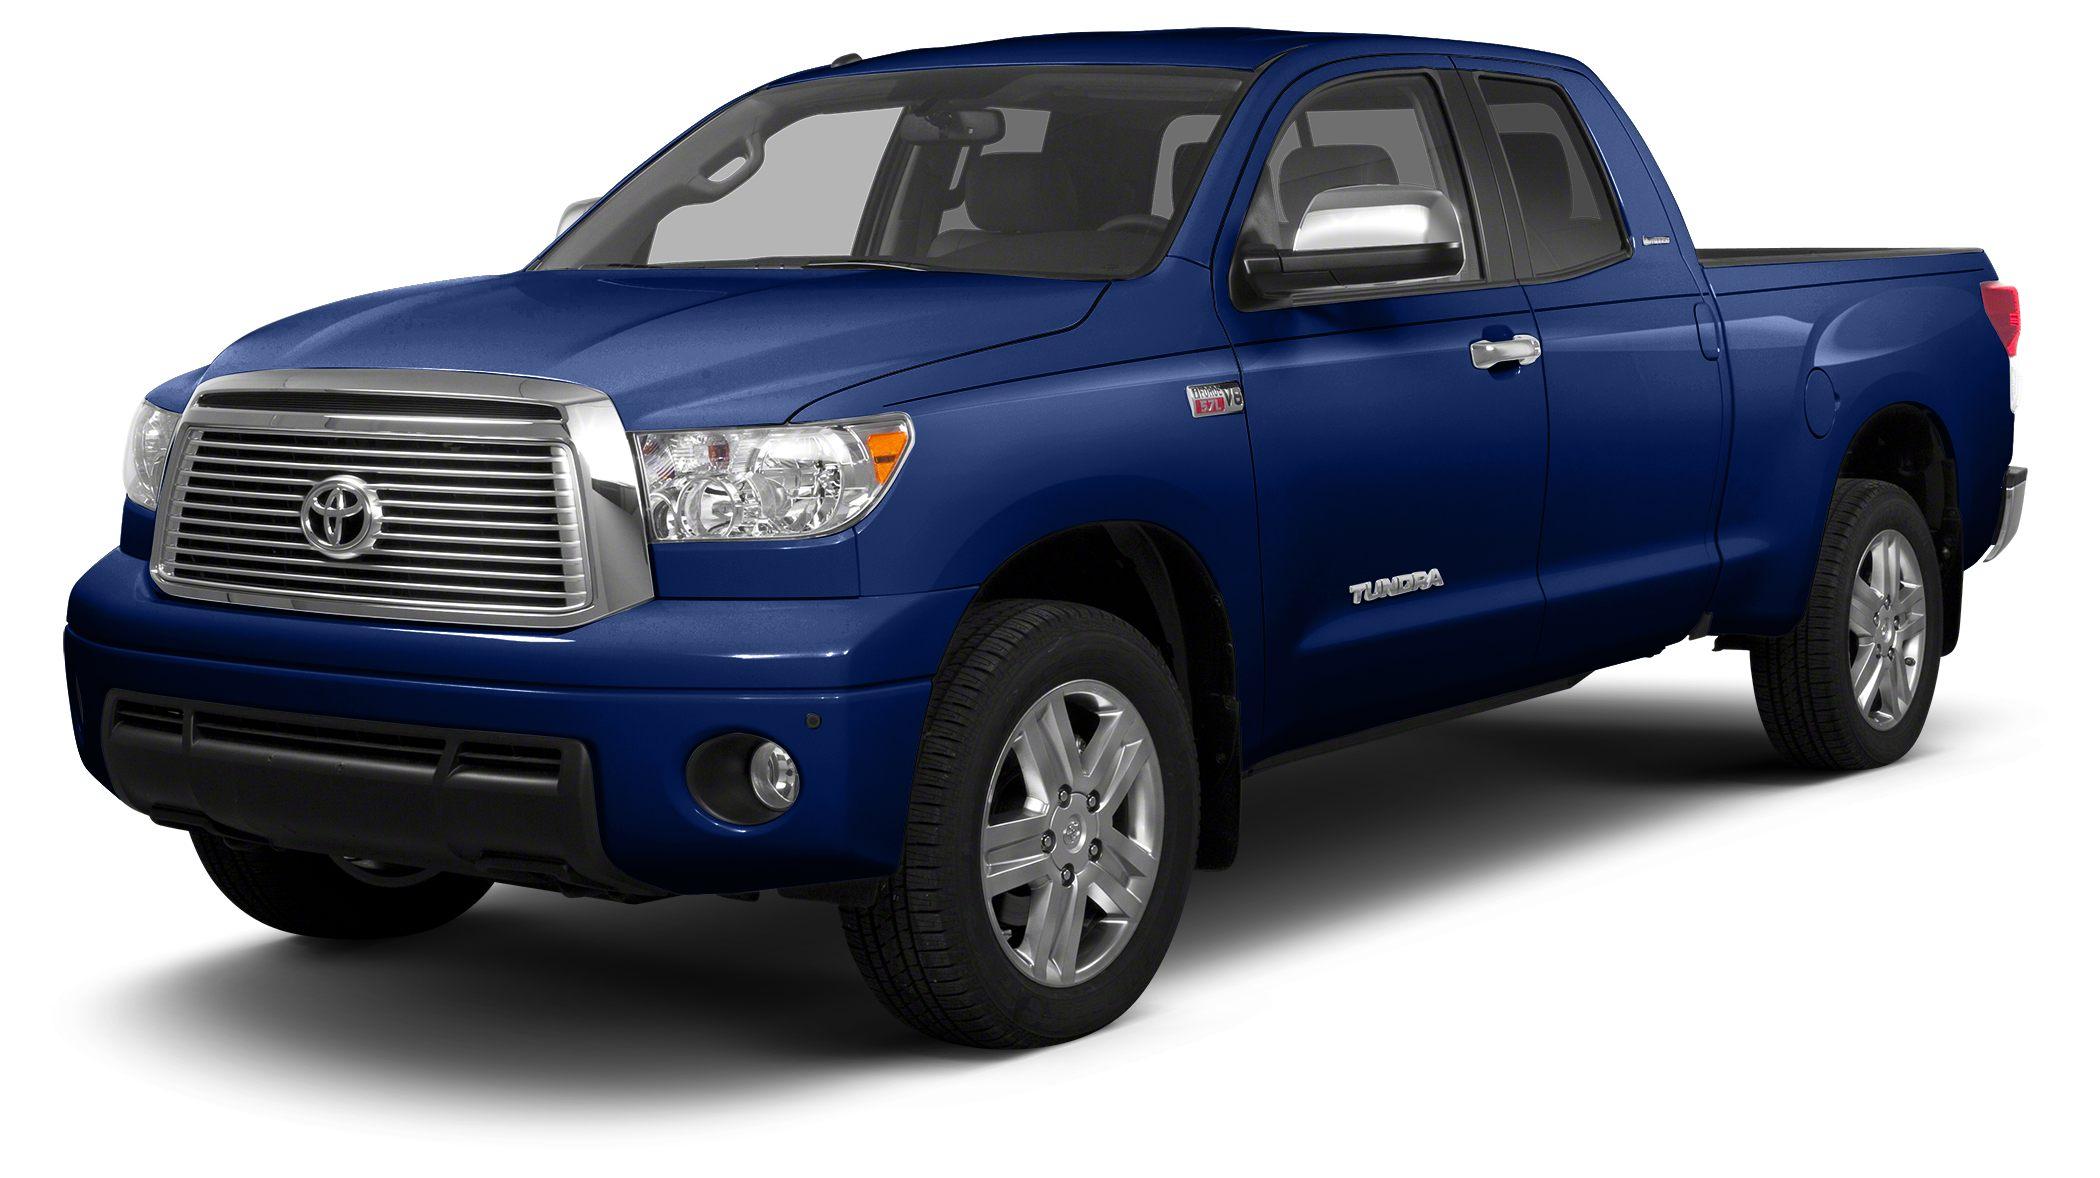 2013 Toyota Tundra Grade Miles 40187Color Blue Stock 41598B VIN 5TFCY5F17DX015515